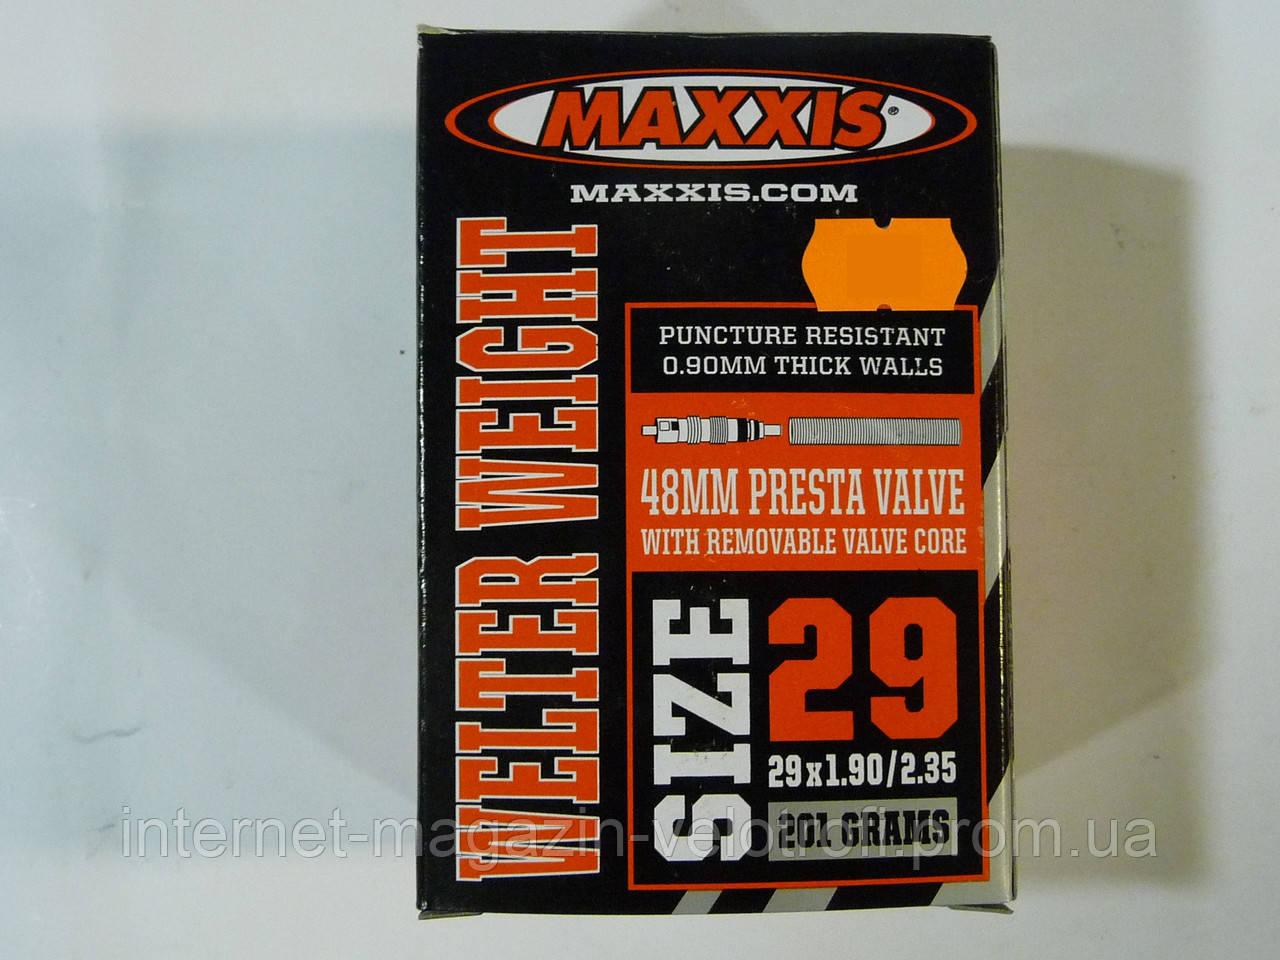 Велокамера Maxxis 29x1.90/2.35 F/V